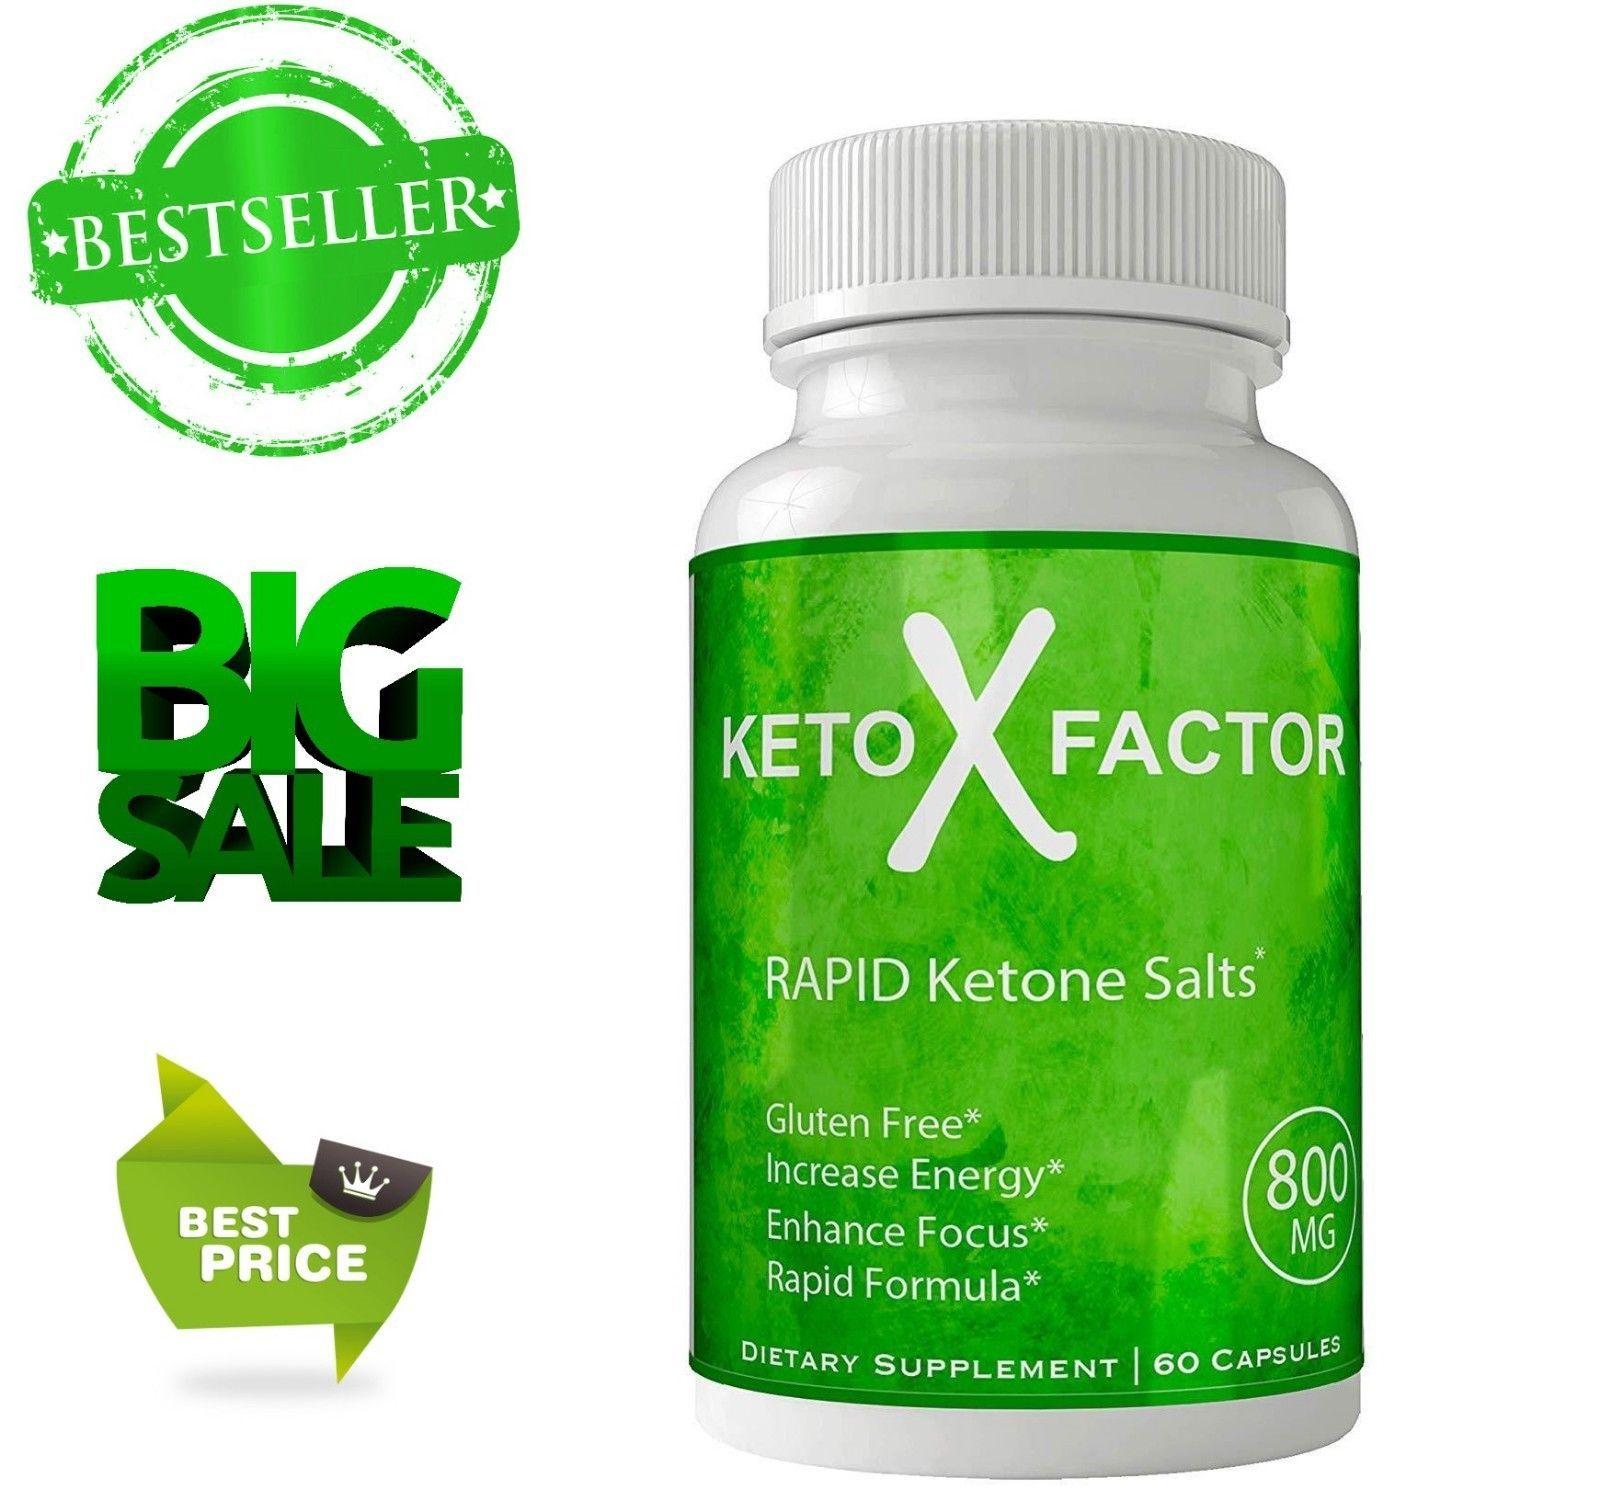 Keto X Factor Weightloss Diet Pills Thermogenic Tone